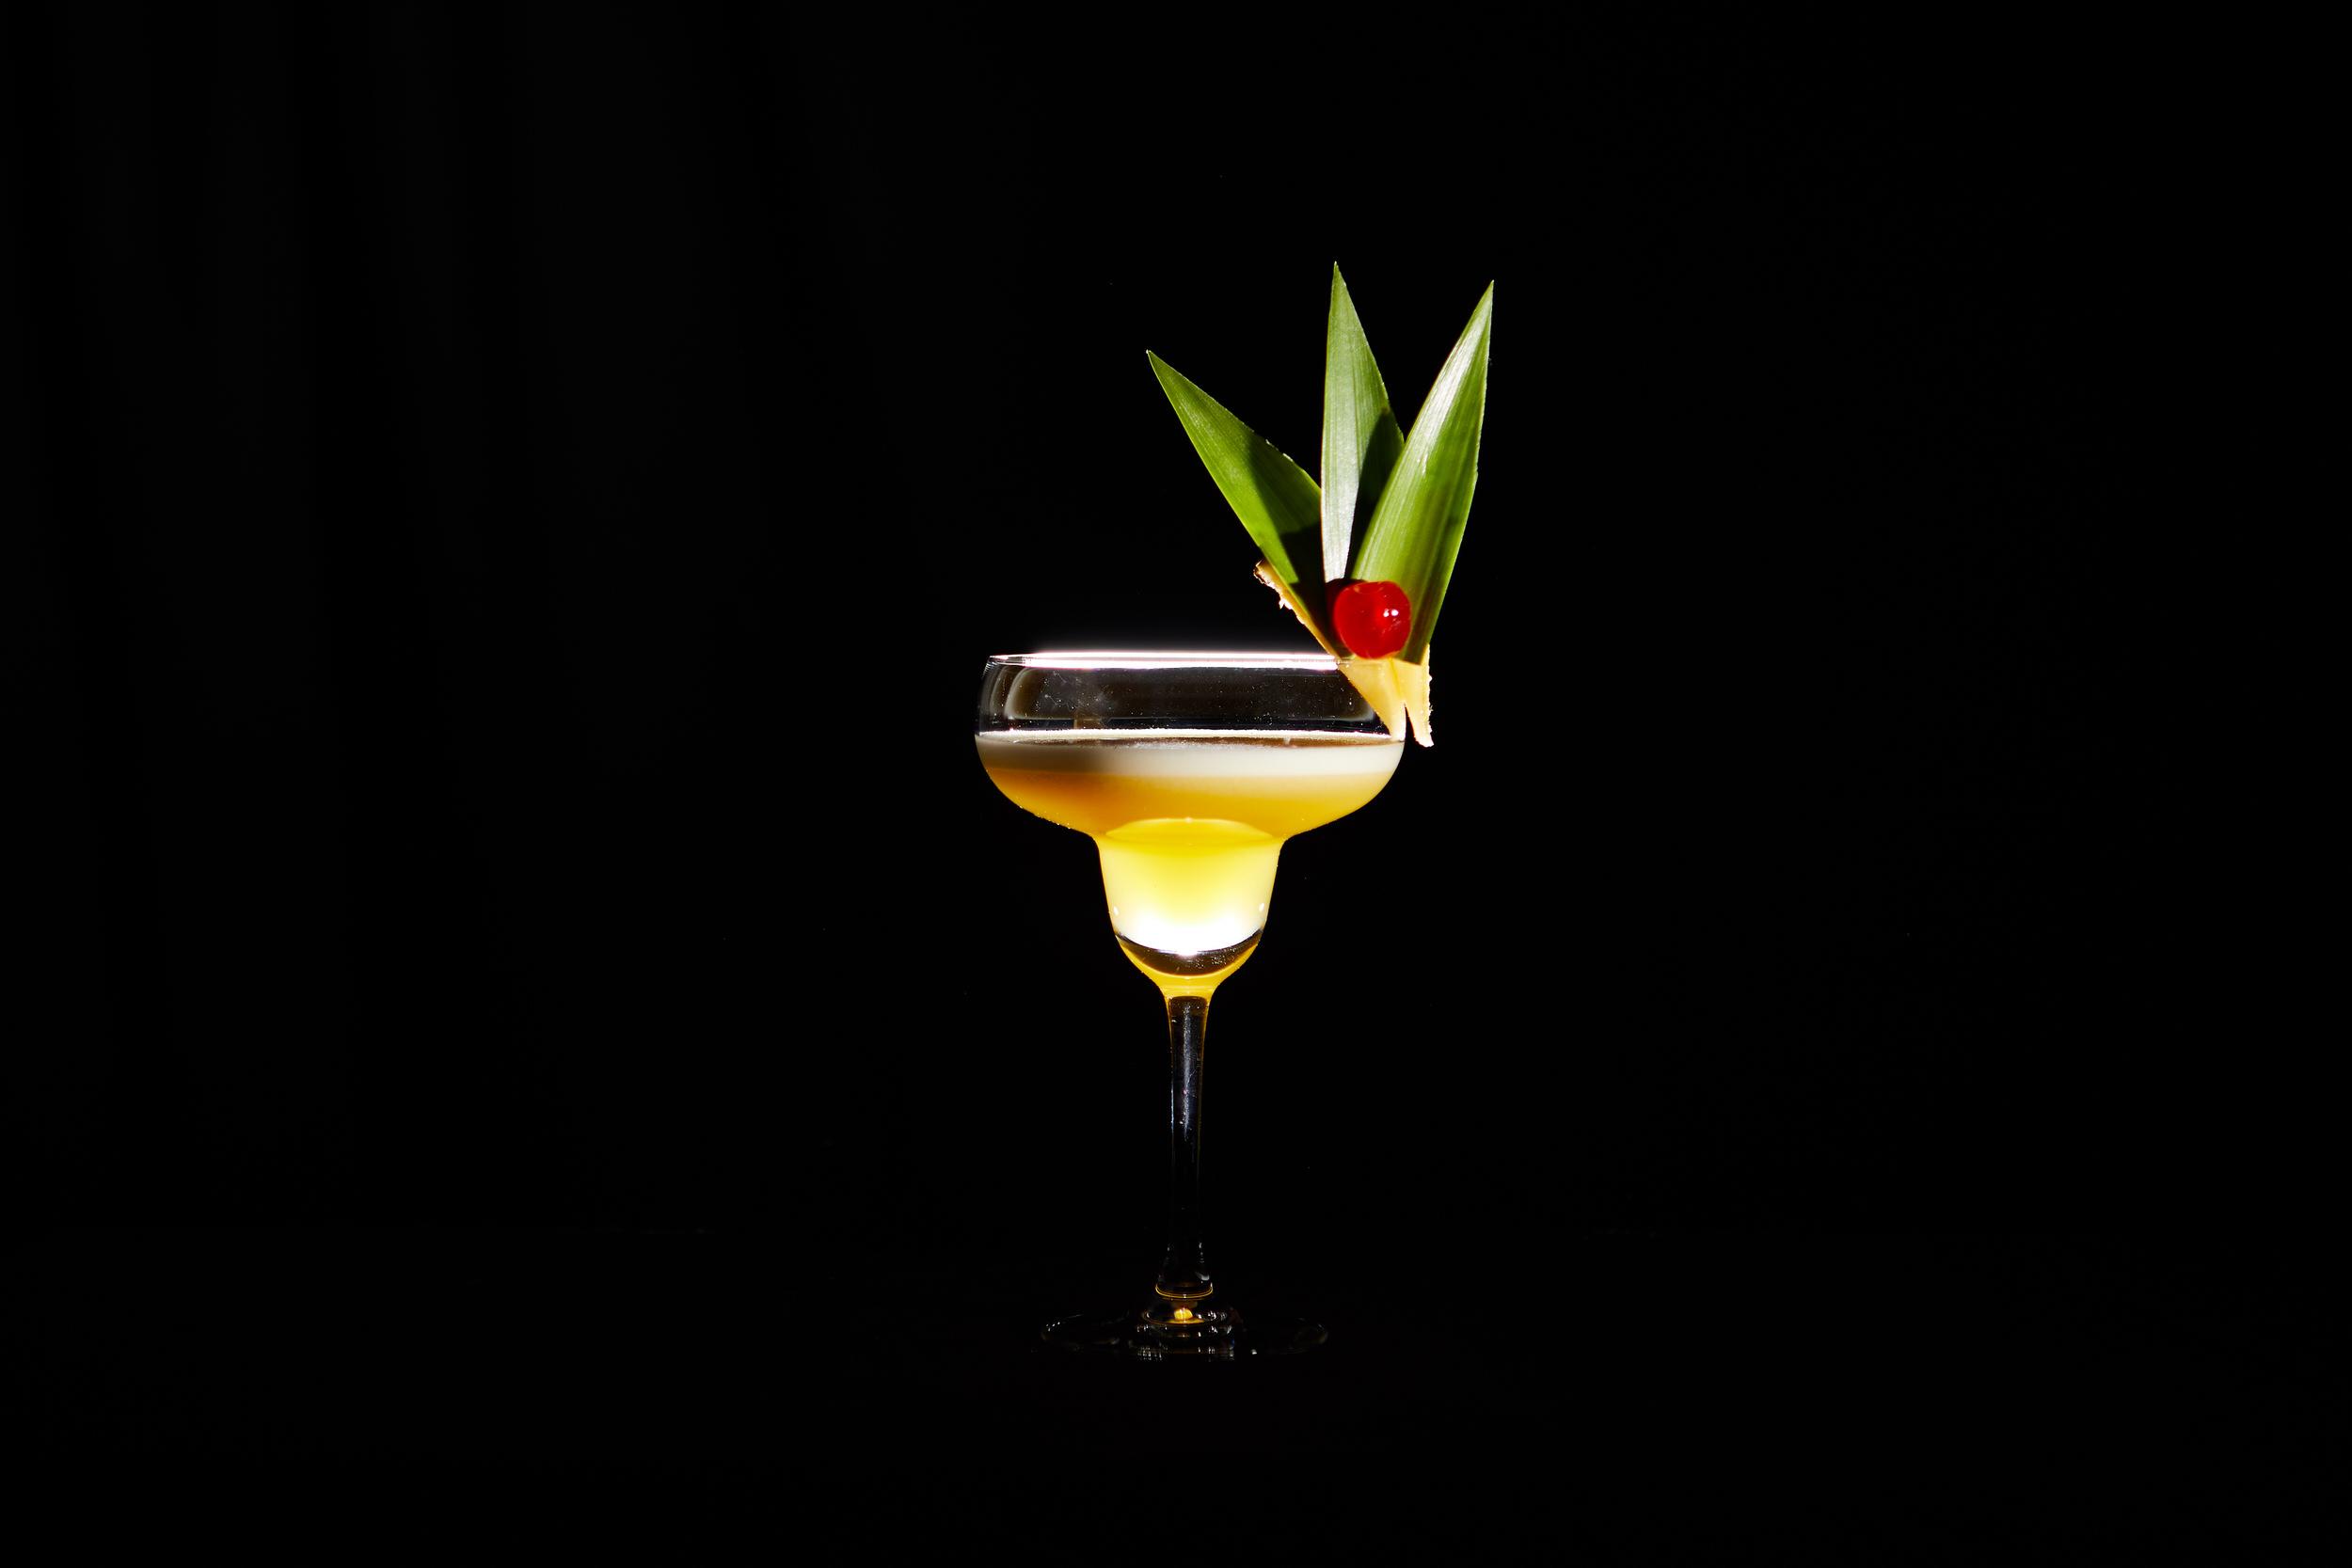 Cocktail-photography-Logrono-La-Rioja-Spain-Sturcke.jpg